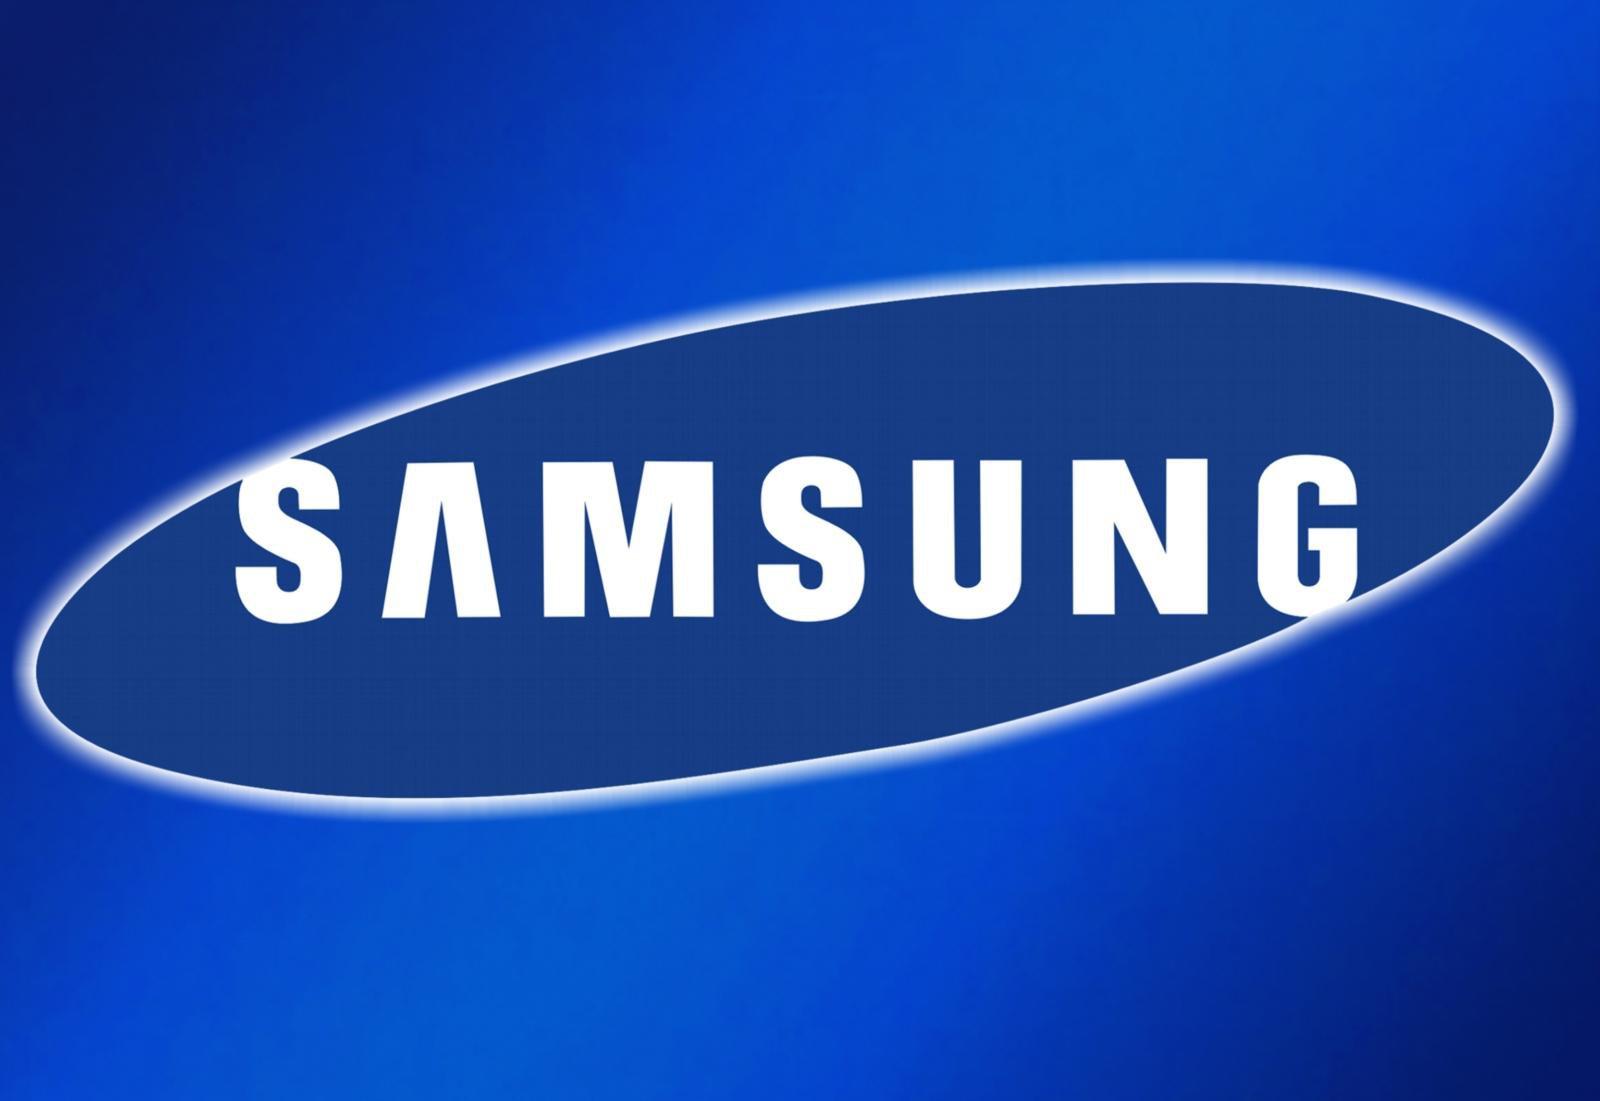 Samsung Galaxy J1 Gets Specs Leaked